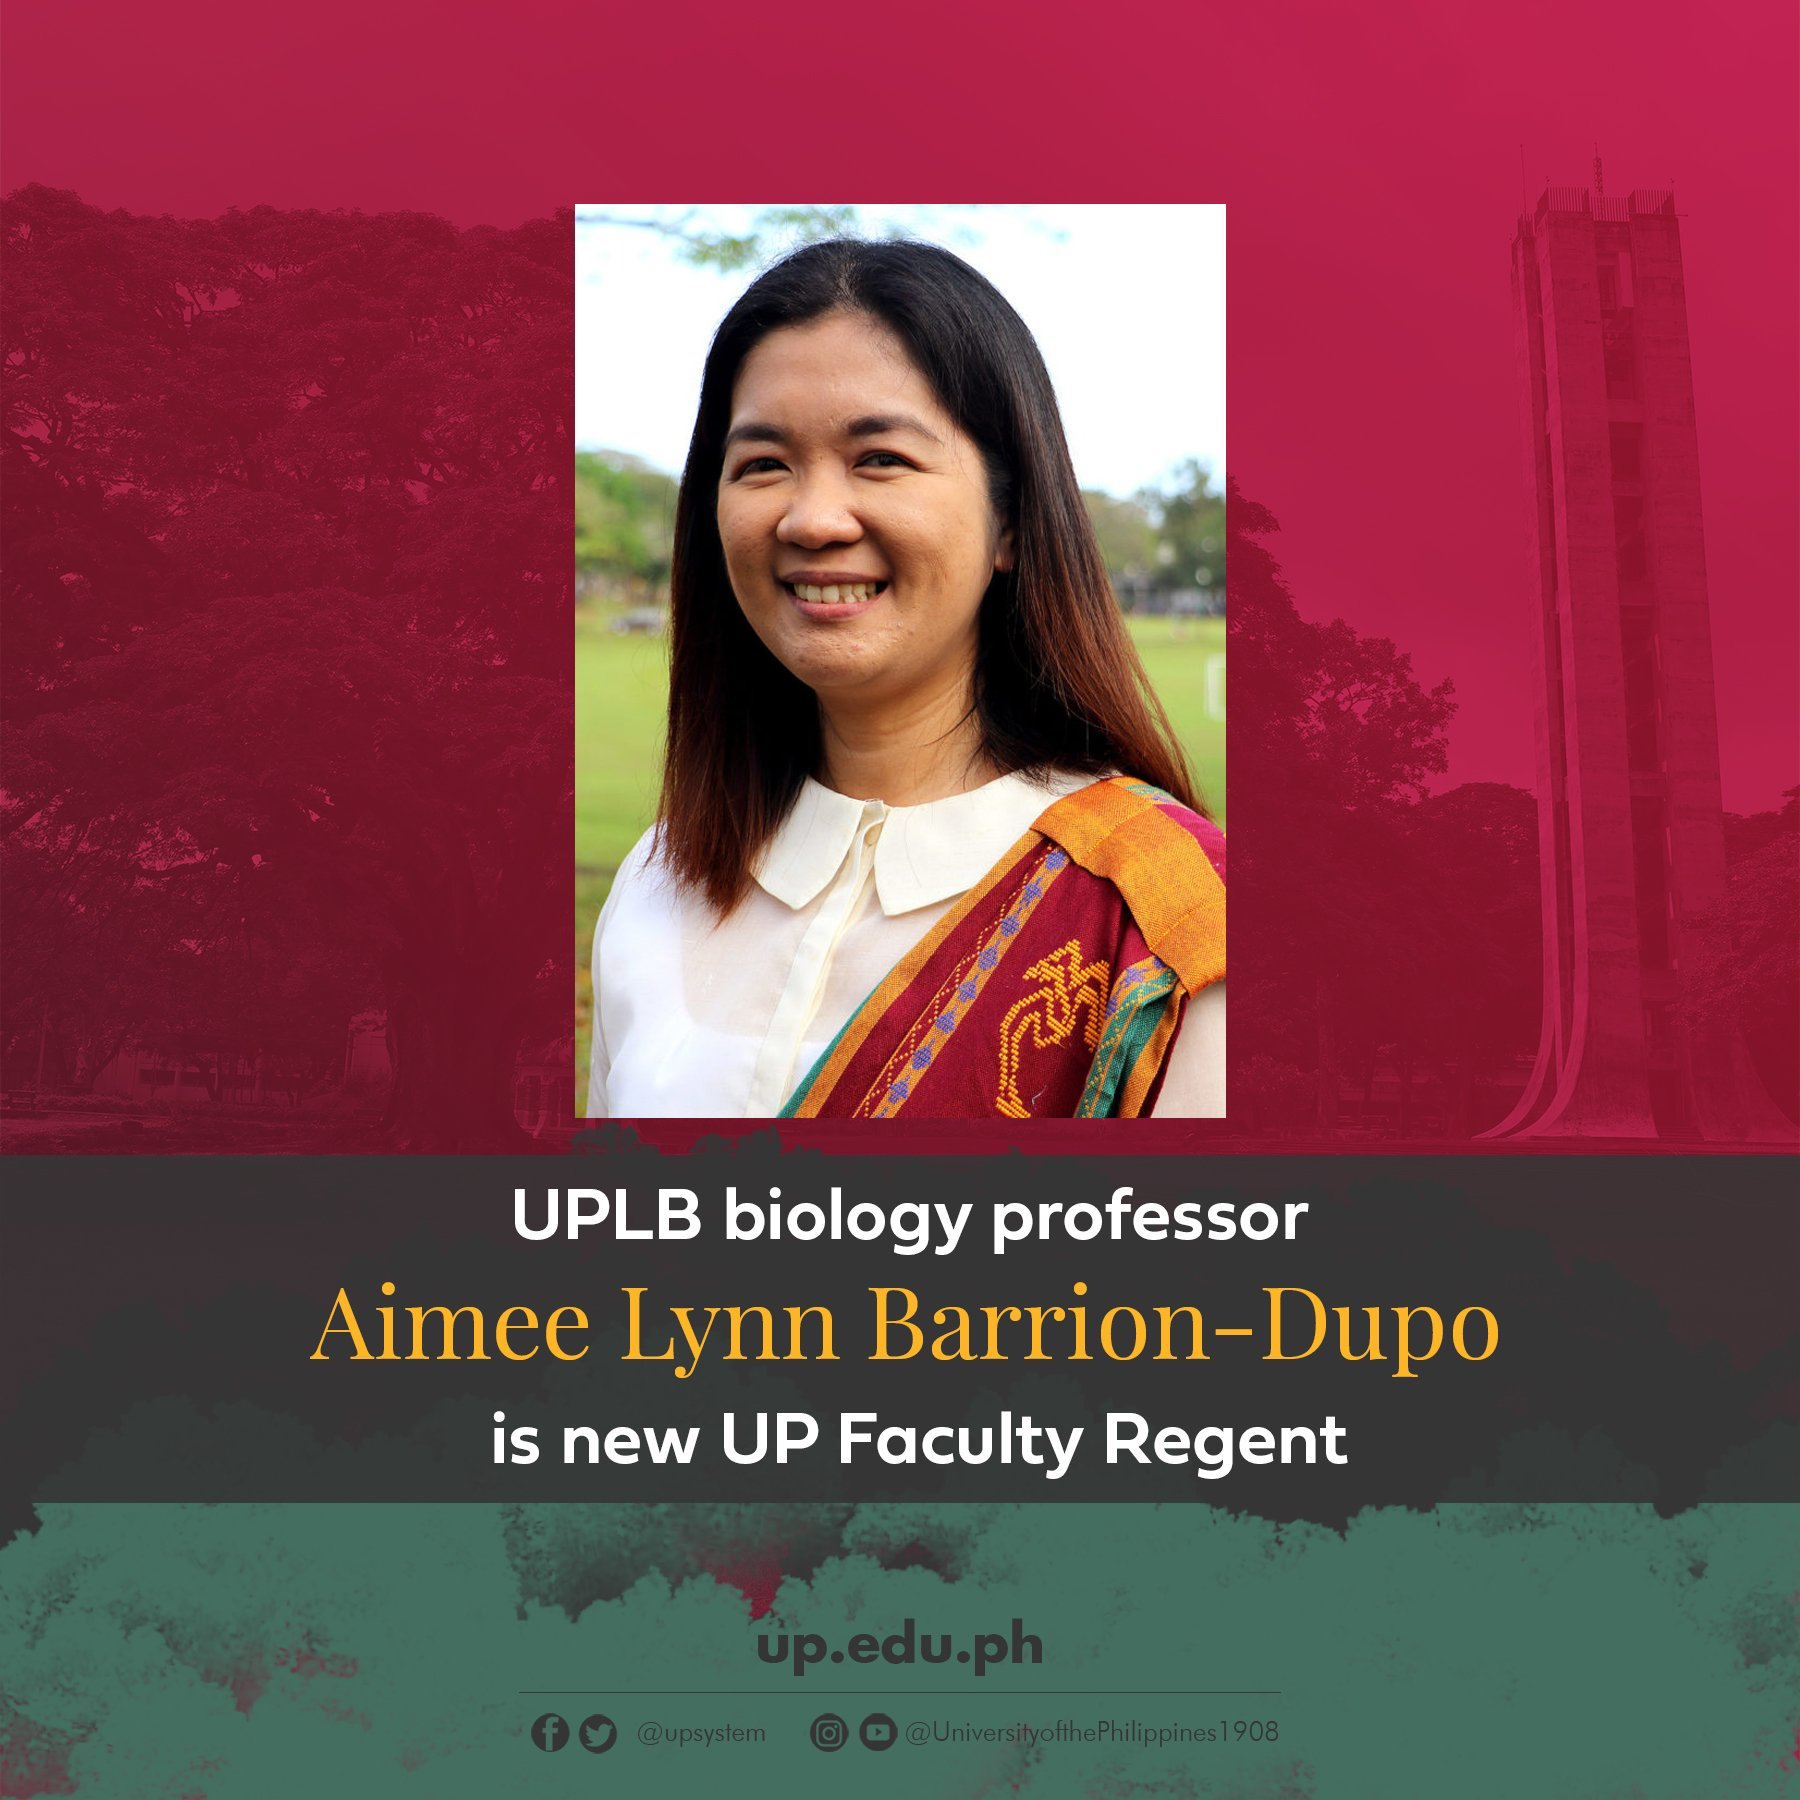 UPLB biology professor Aimee Lynn Barrion-Dupo is new UP Faculty Regen